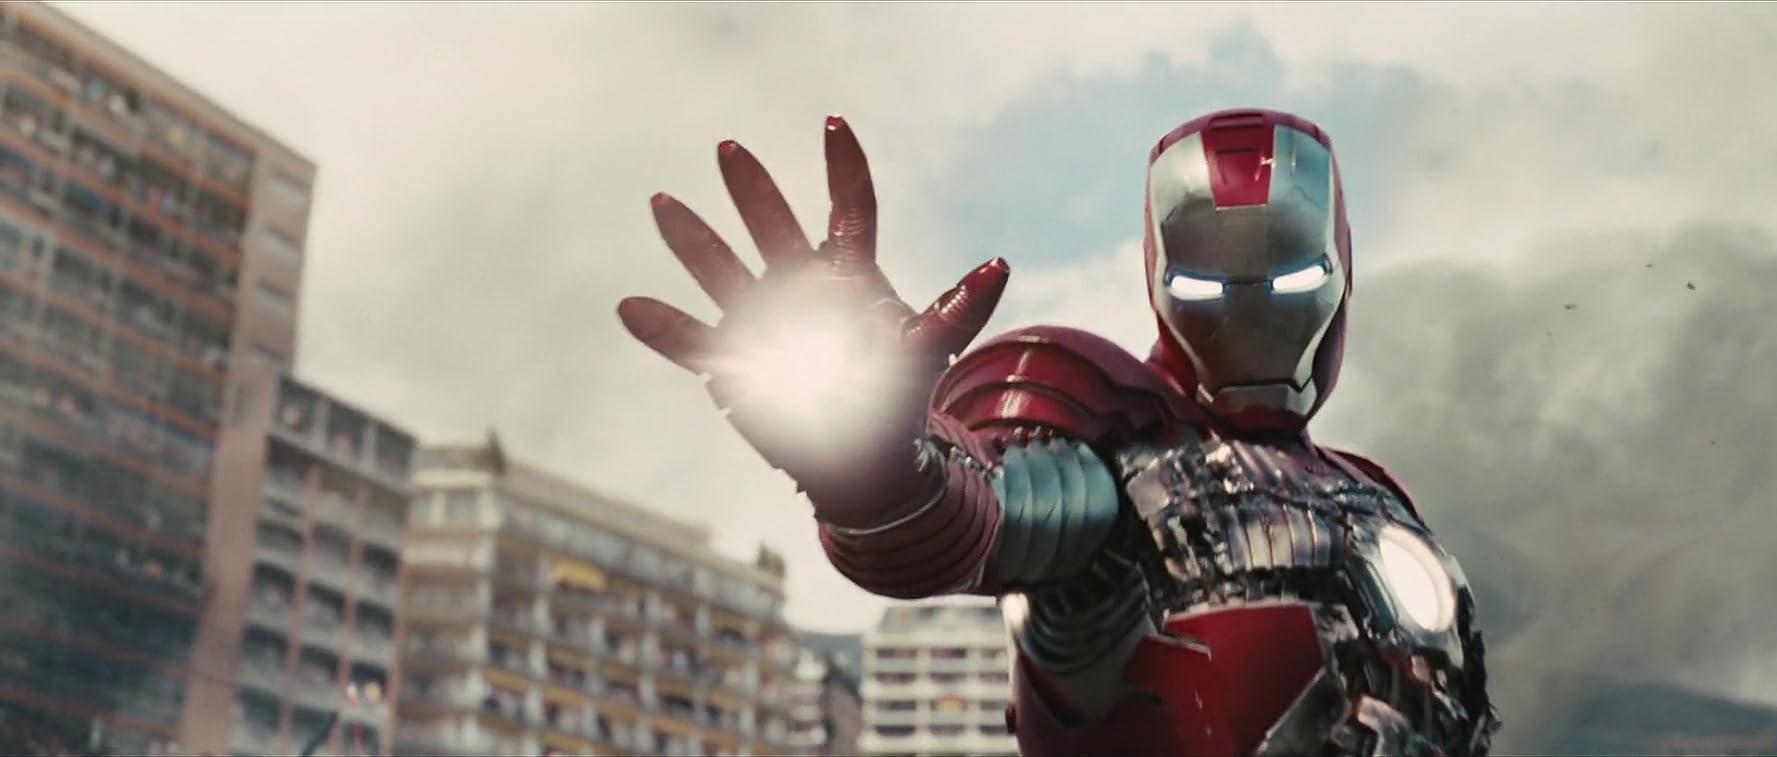 Robert Downey Jr. in Iron Man 2 (2010)